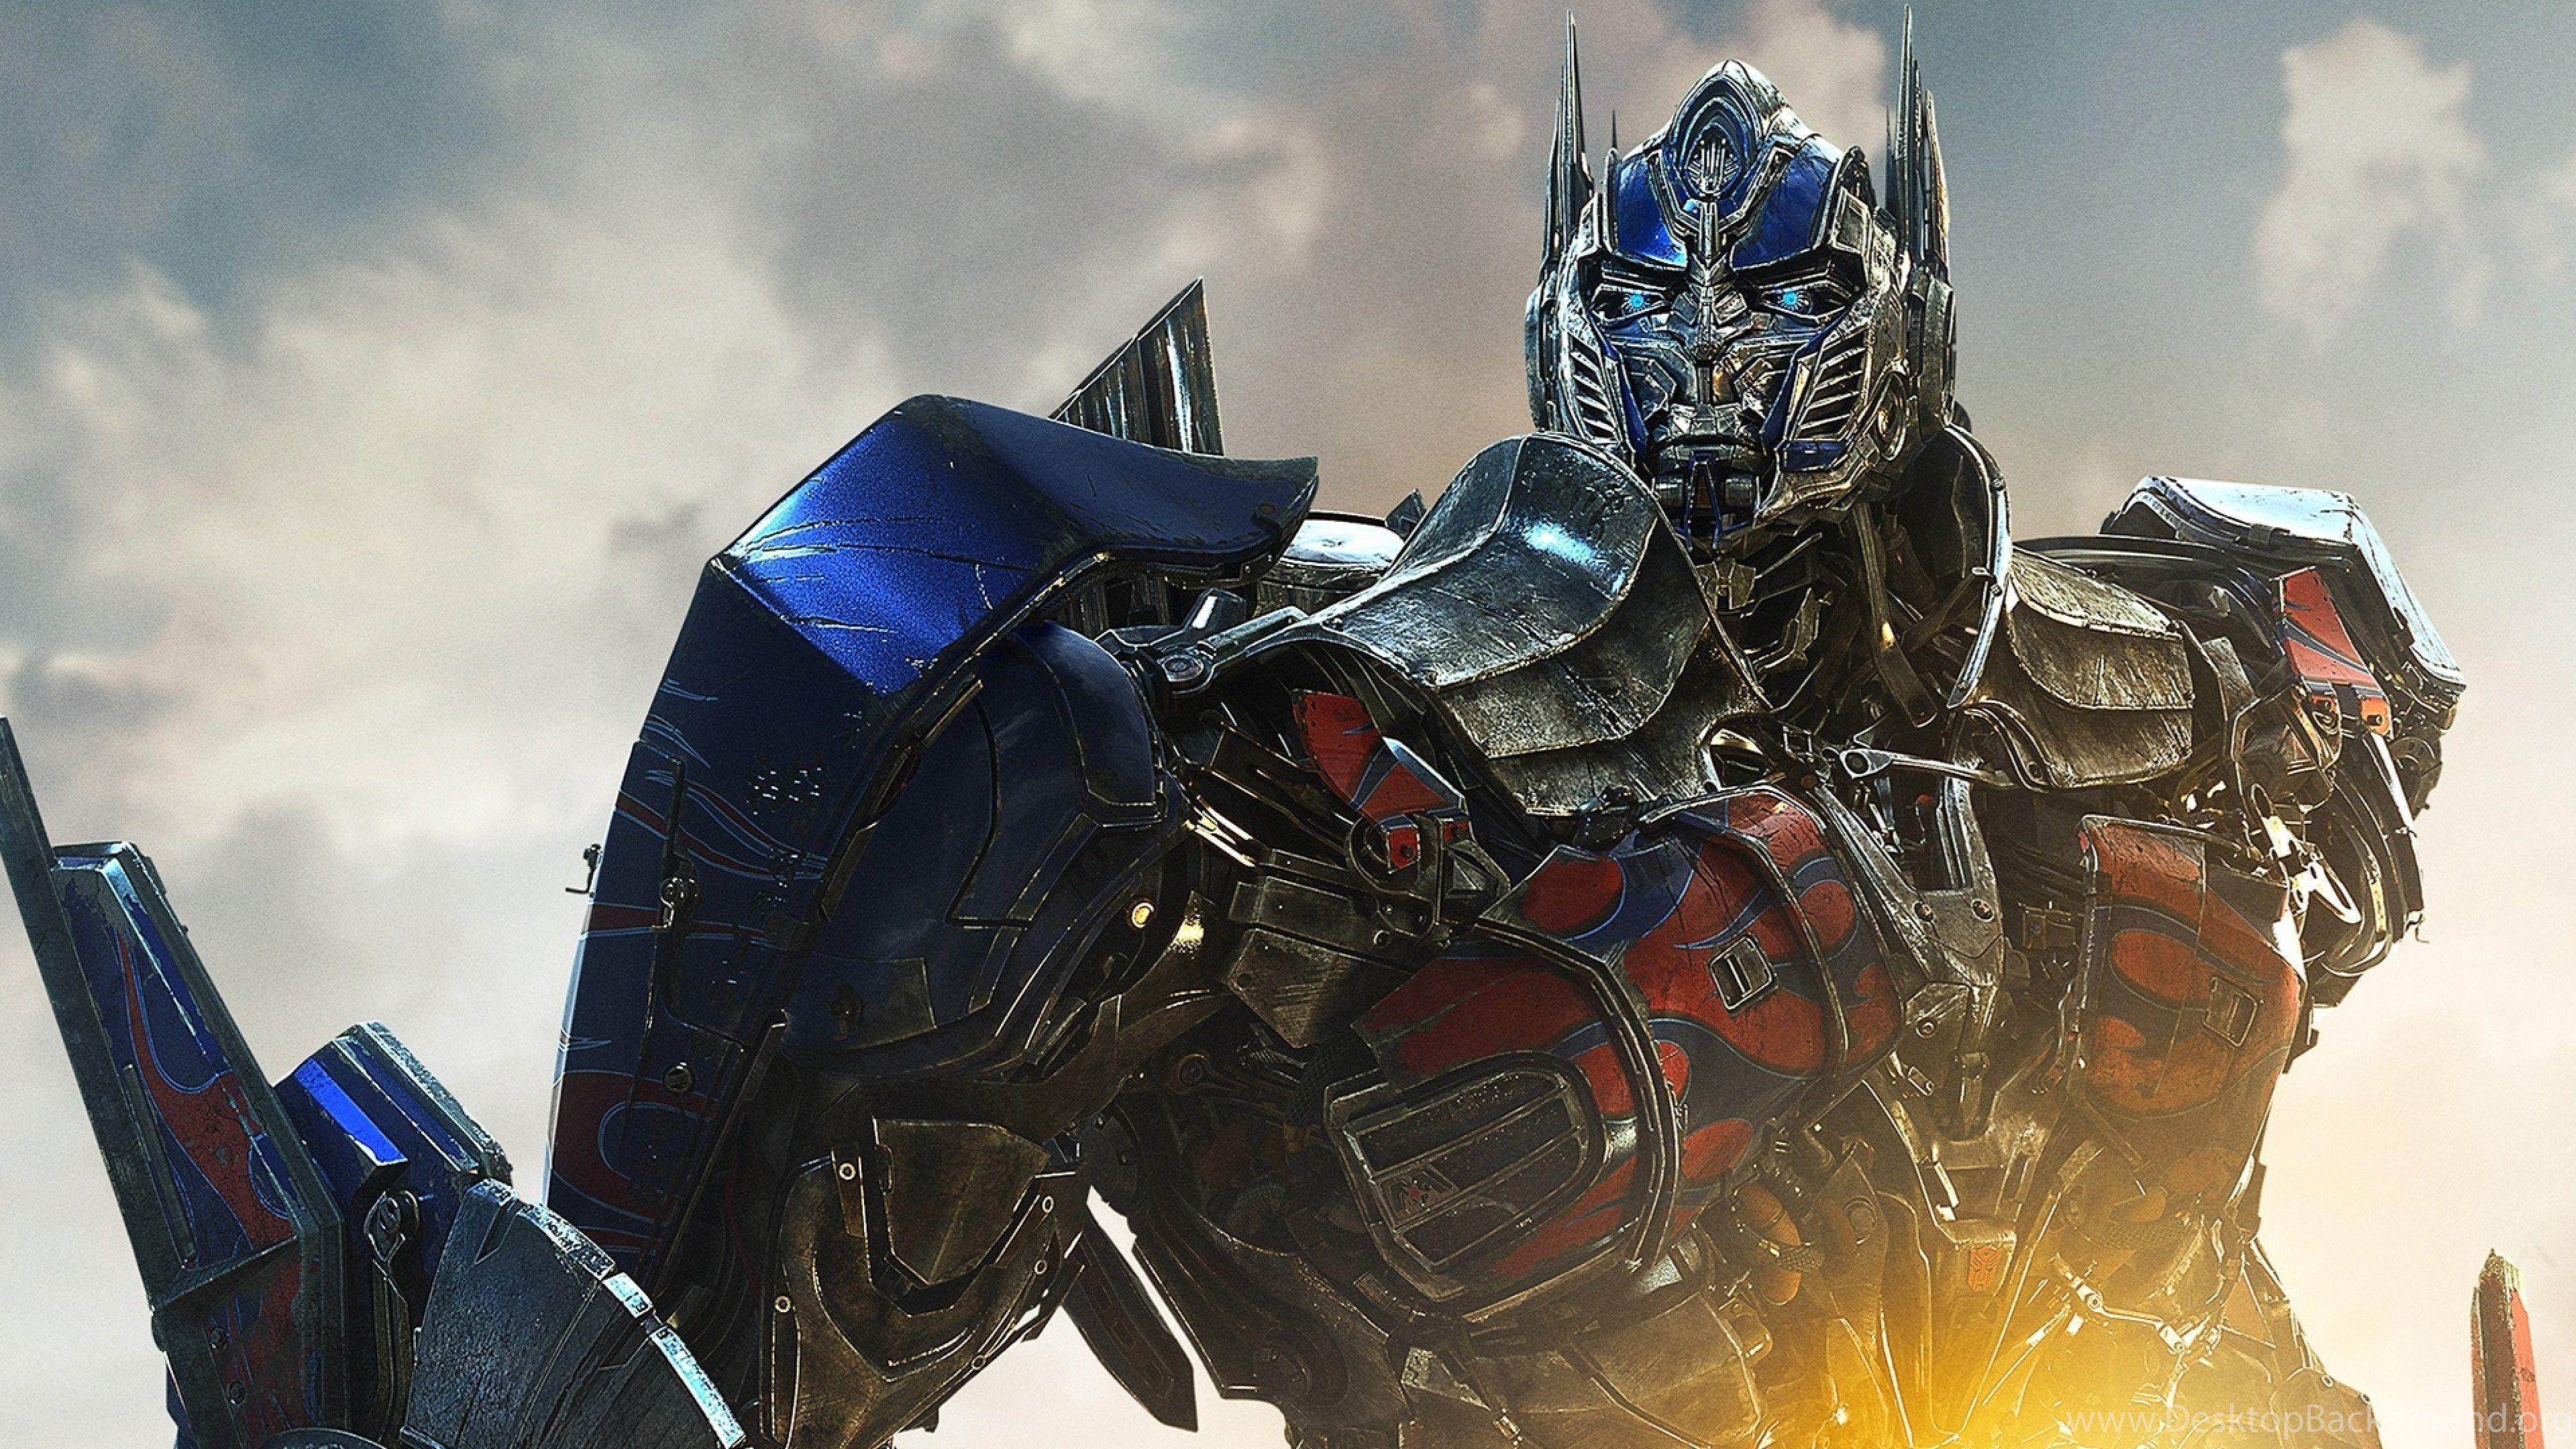 4k ultra hd transformers wallpapers top free 4k ultra hd - Transformers prime wallpaper ...